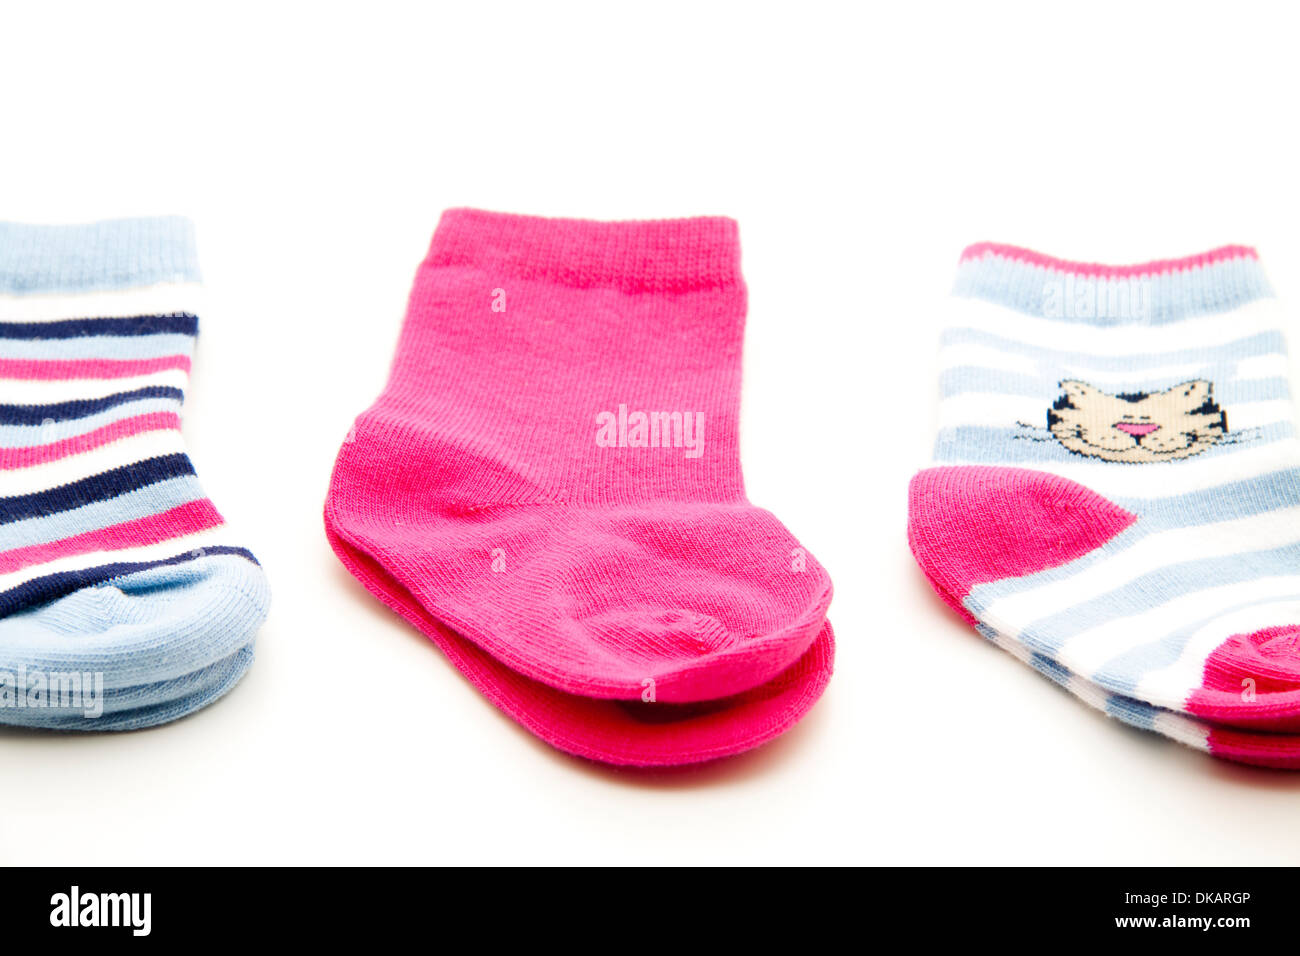 Baby socks - Stock Image